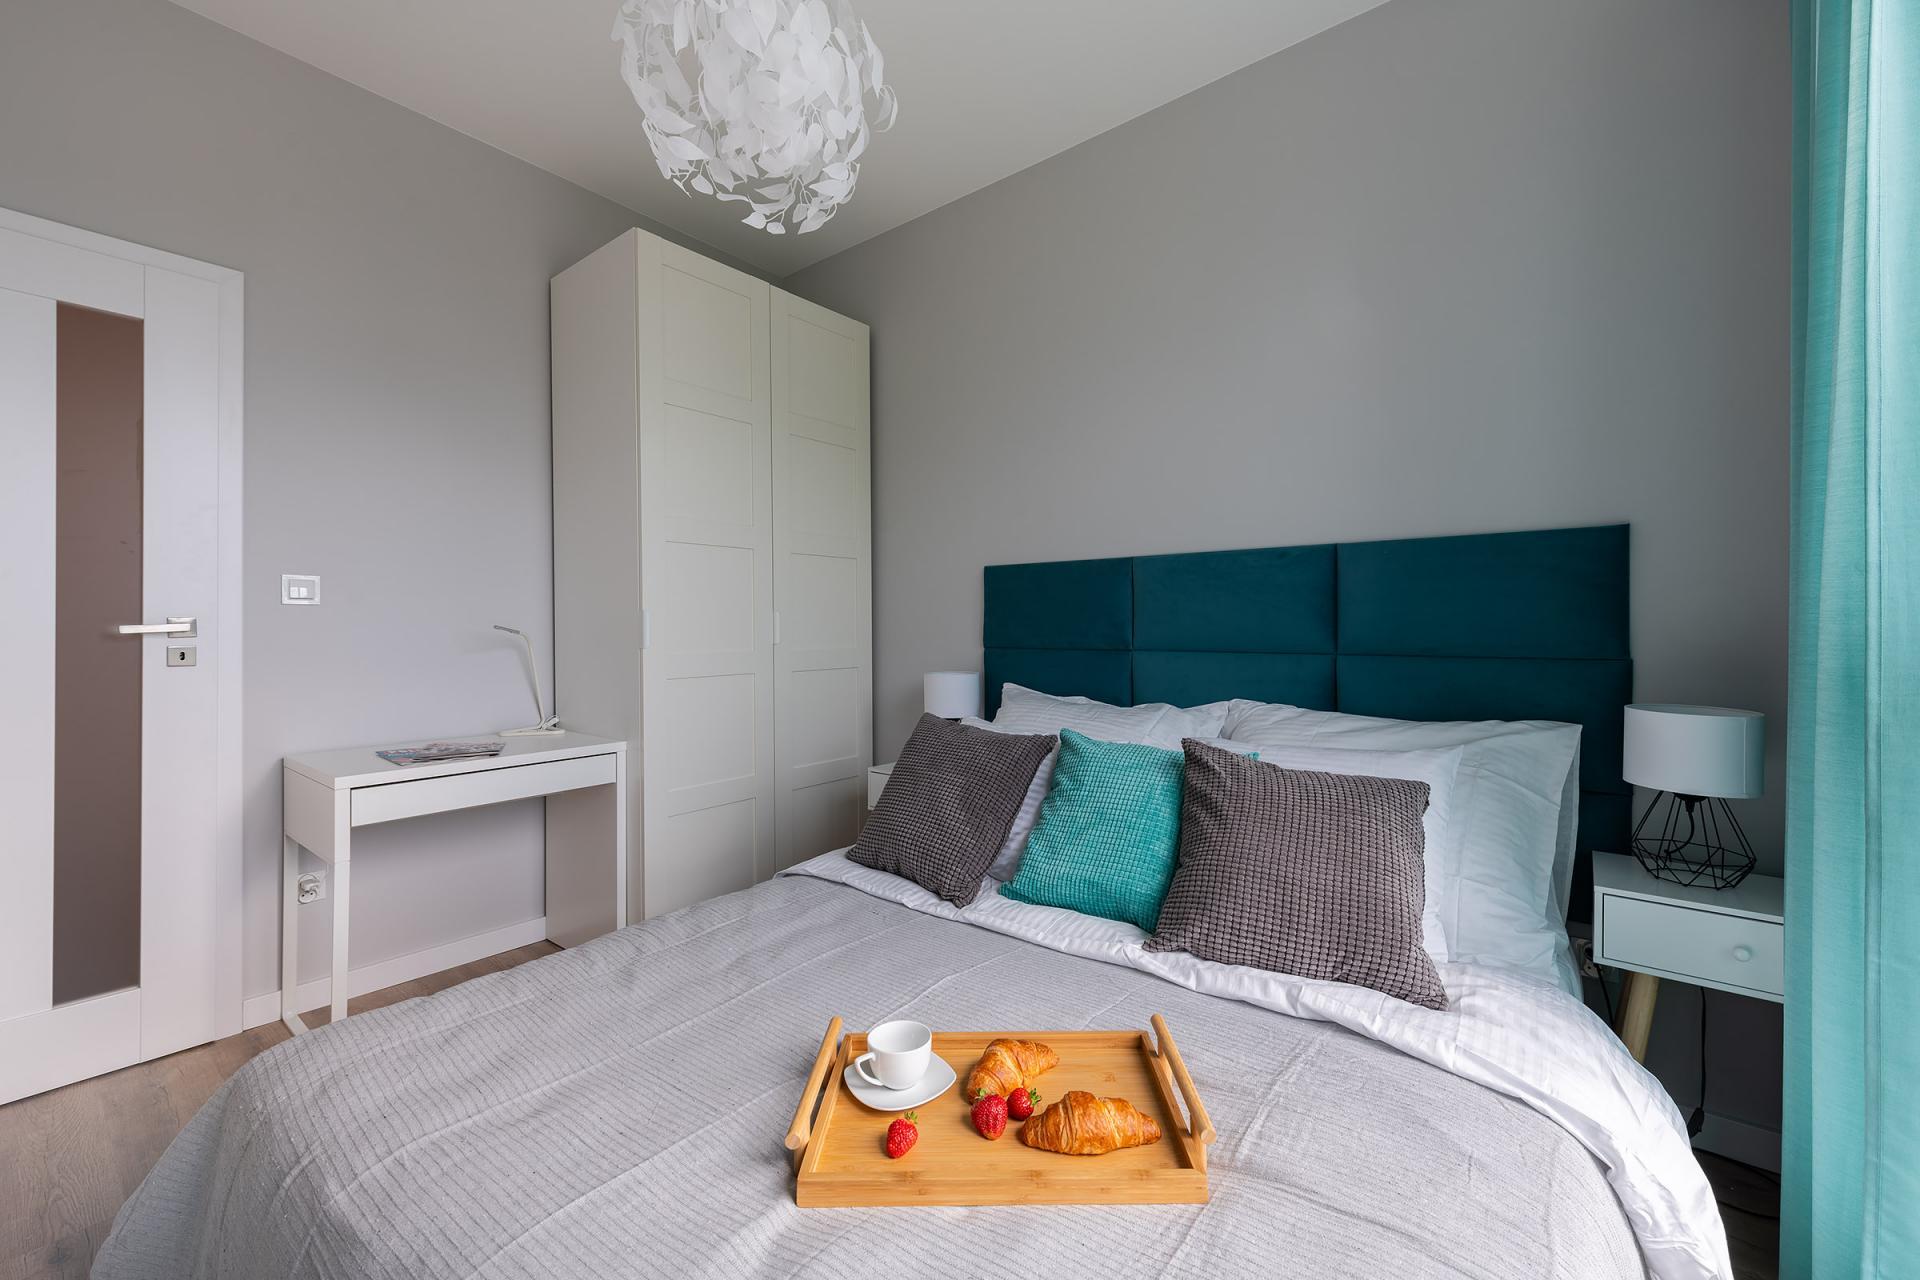 Comfortable bed at Cybernetyki 4 Apartment, Sluzewiec, Warsaw